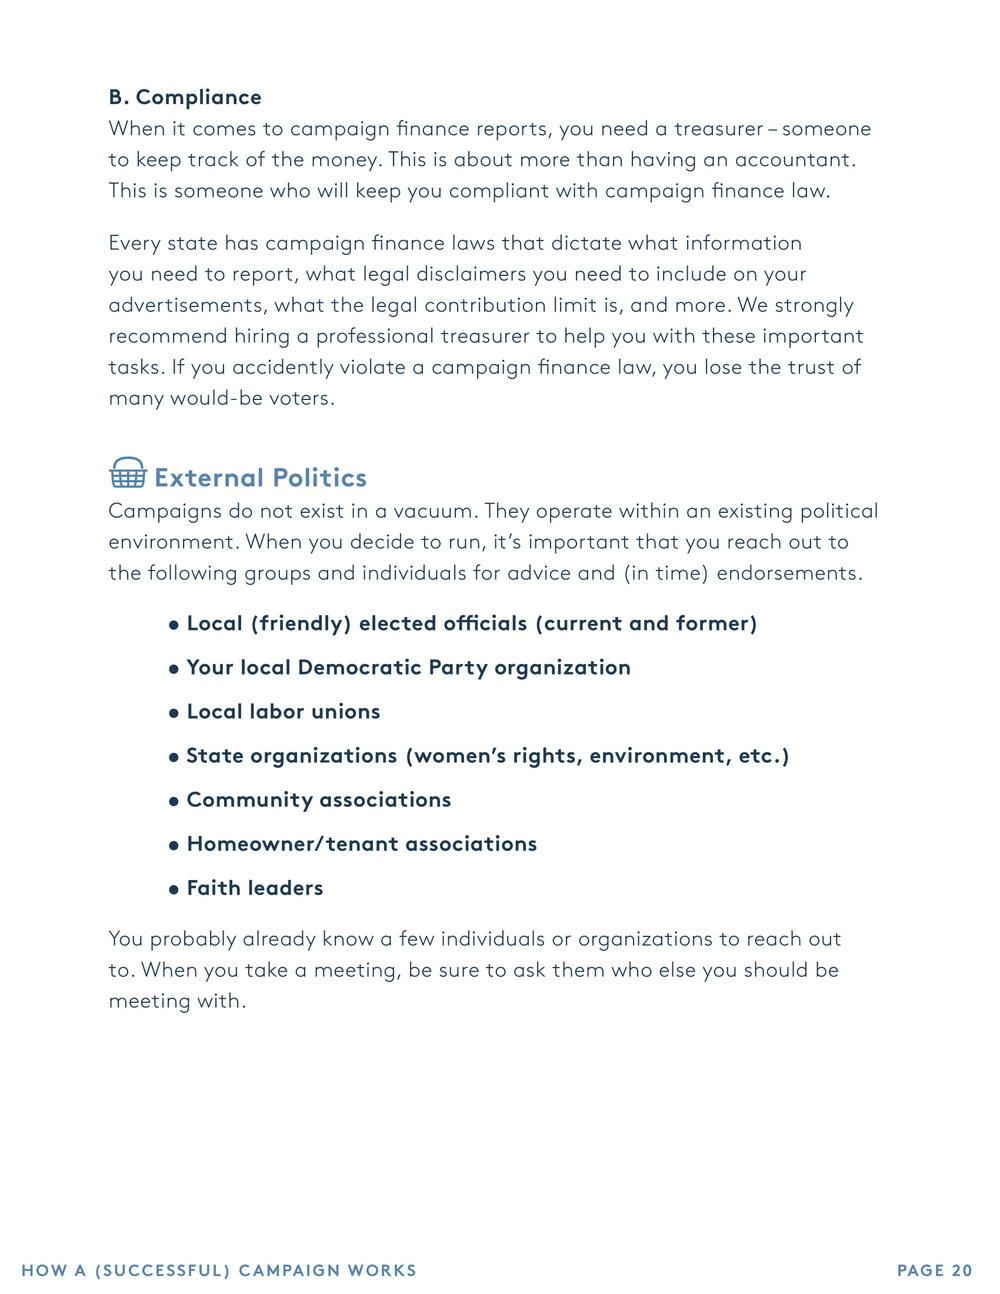 HSG_CampaignGuide_v5-20.jpg